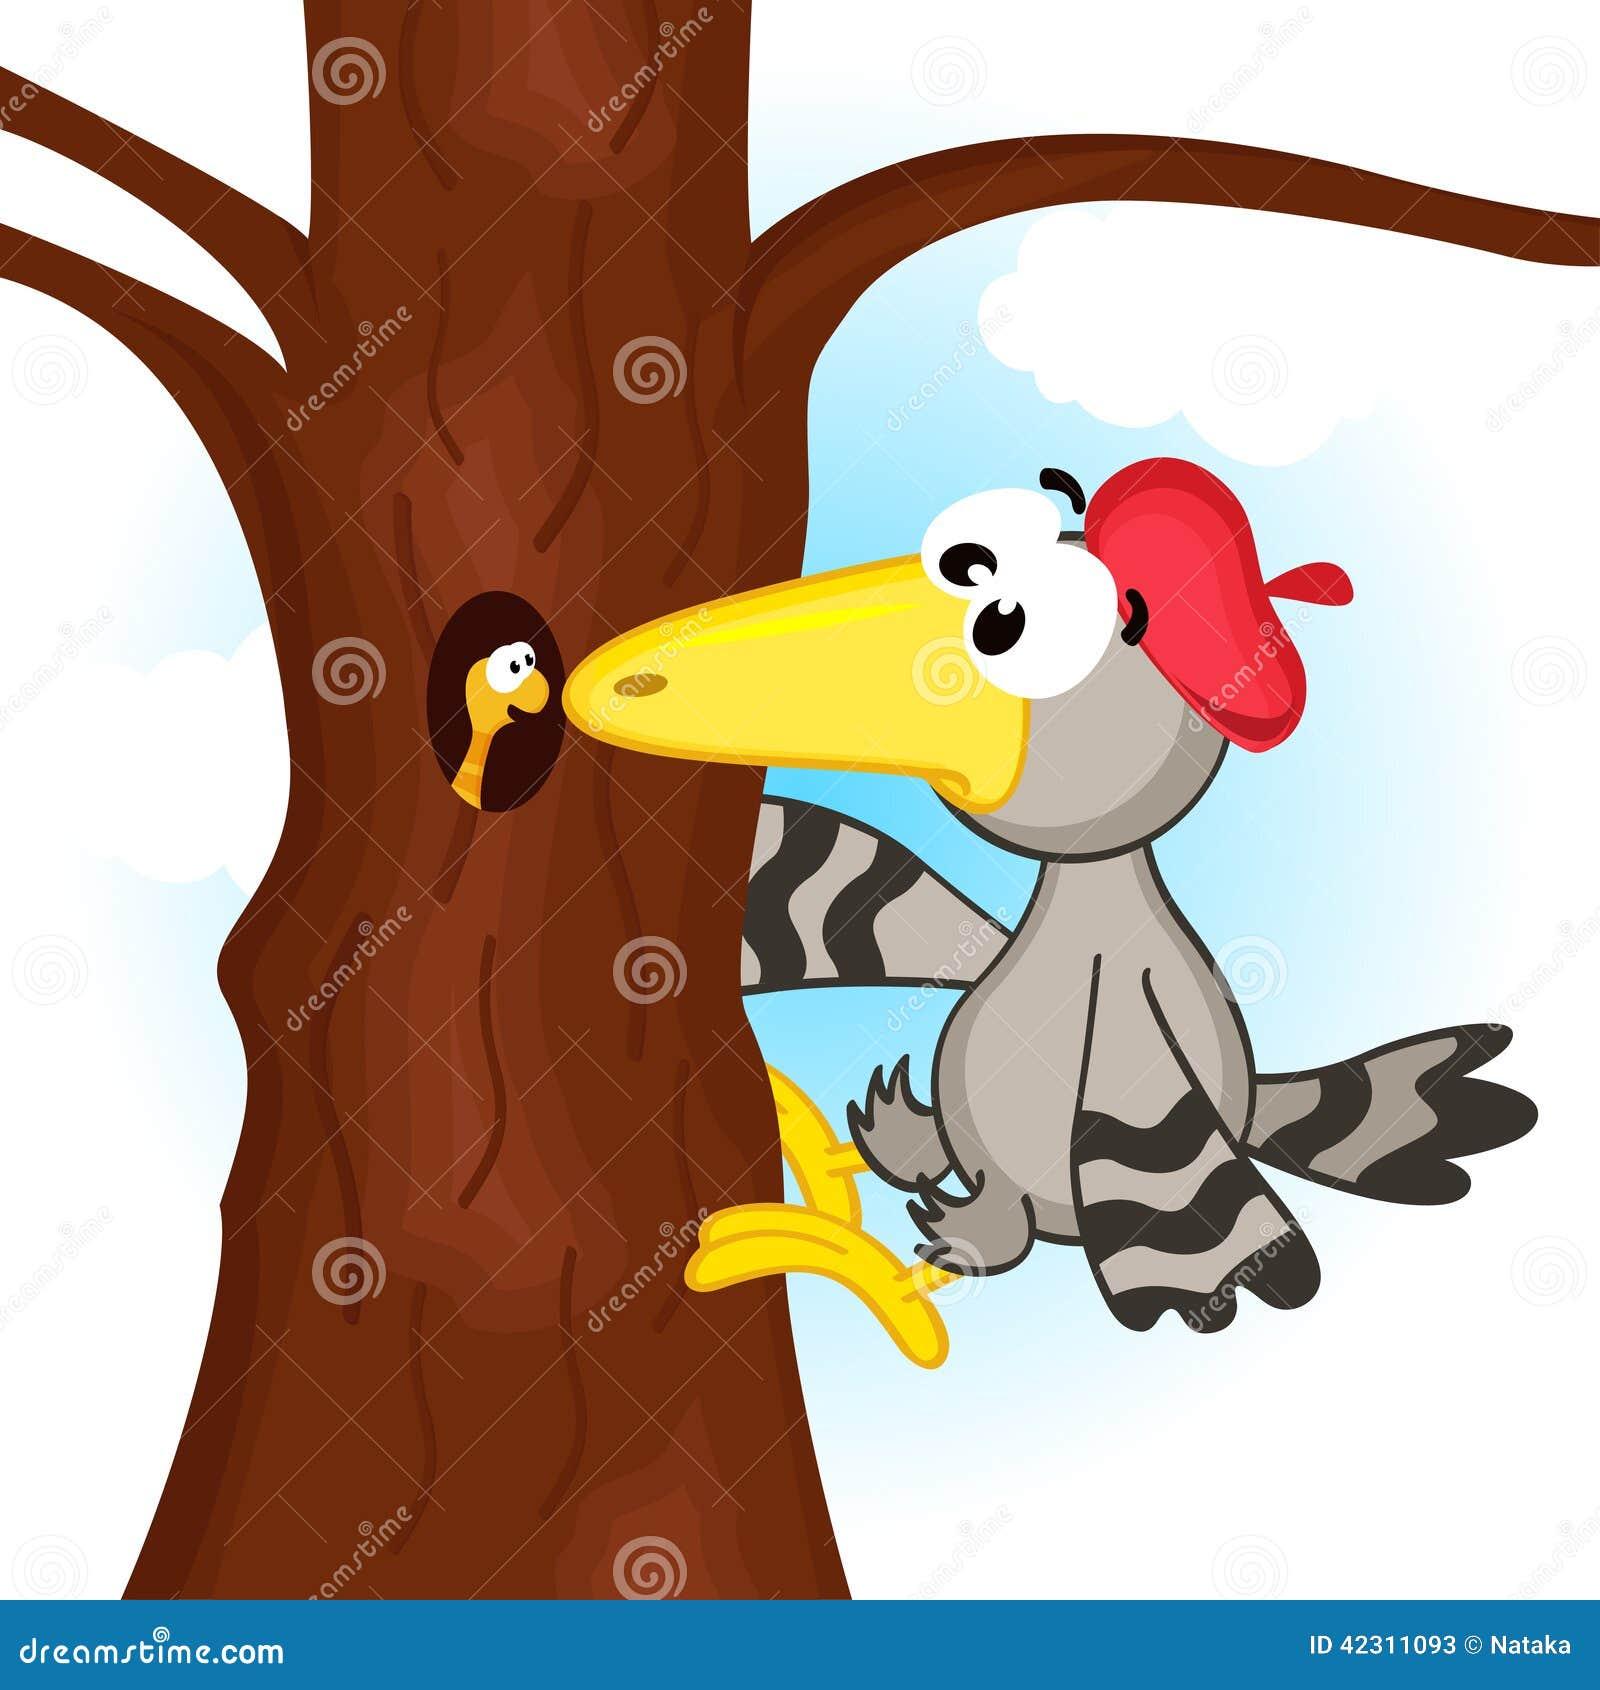 Woodpecker On Tree Stock Vector - Image: 42311093